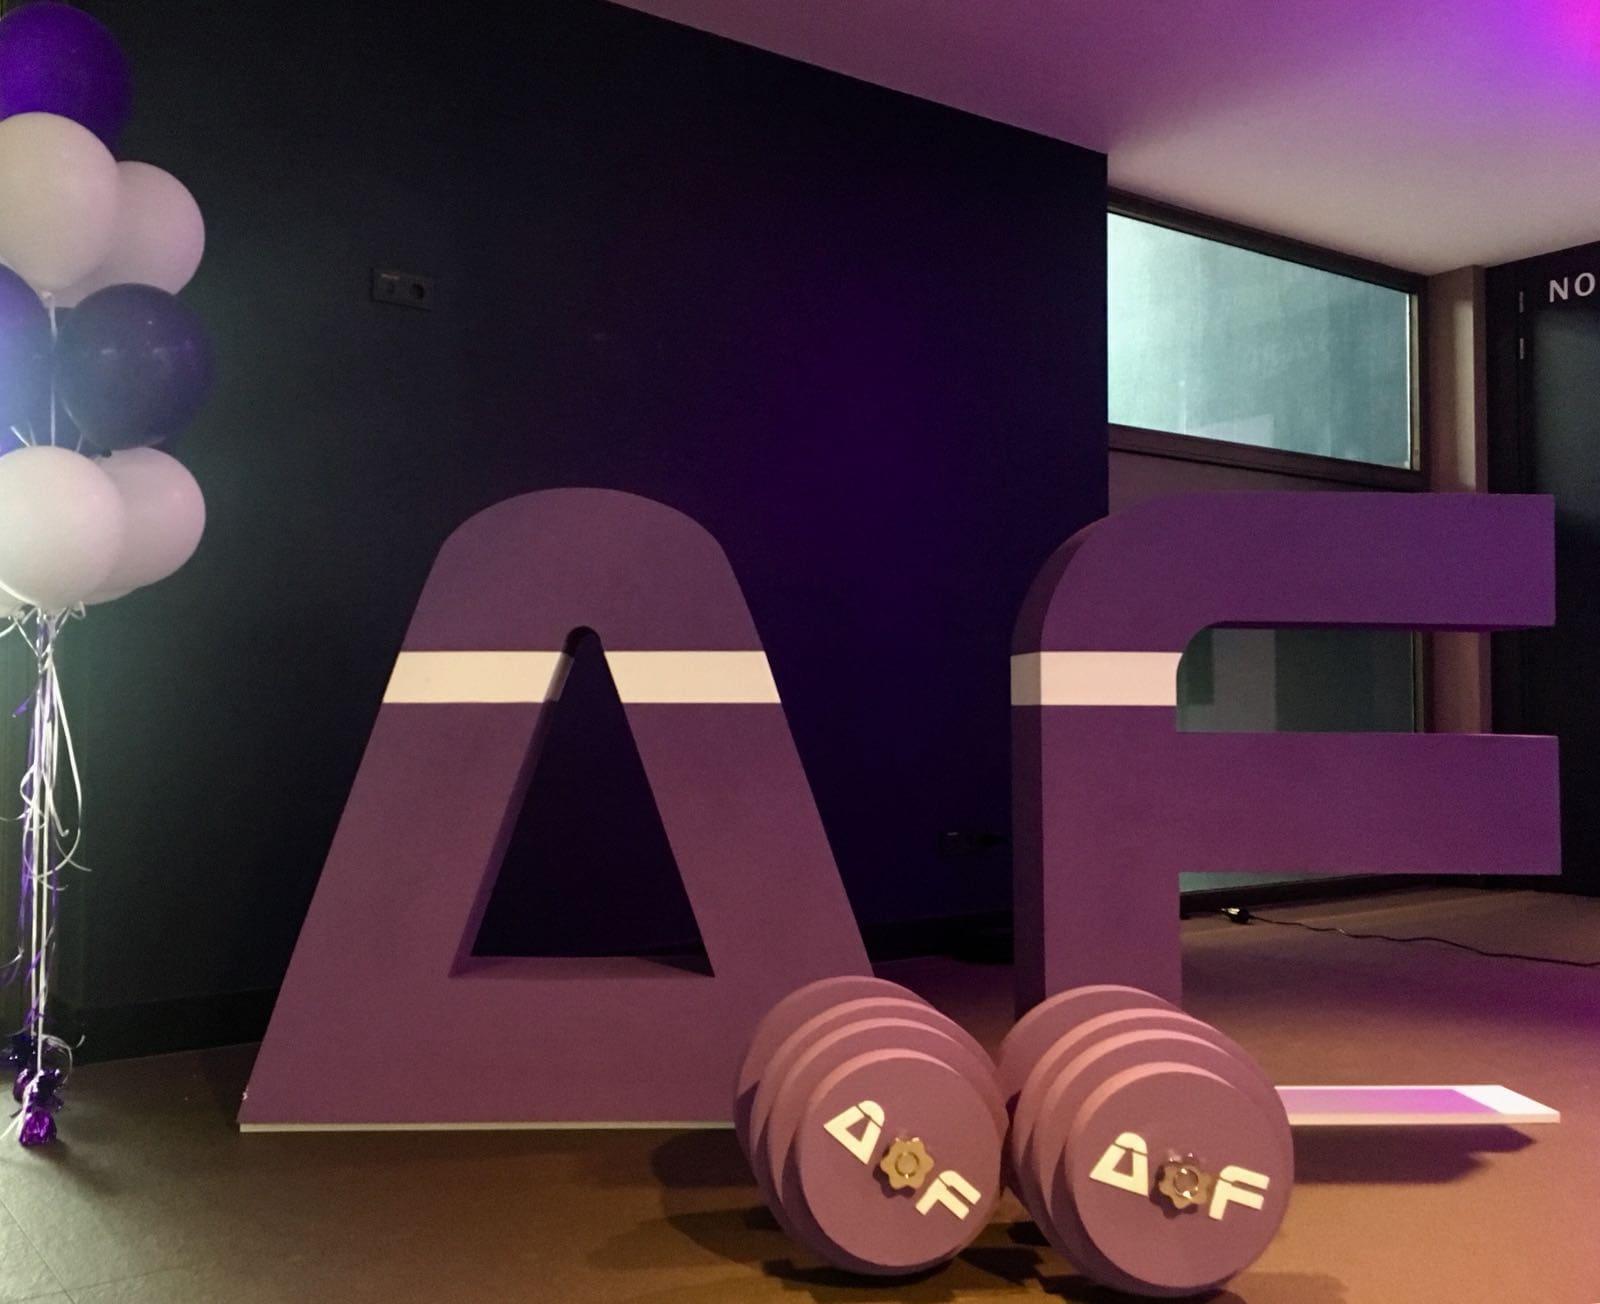 AF-piepschuim-logo-2